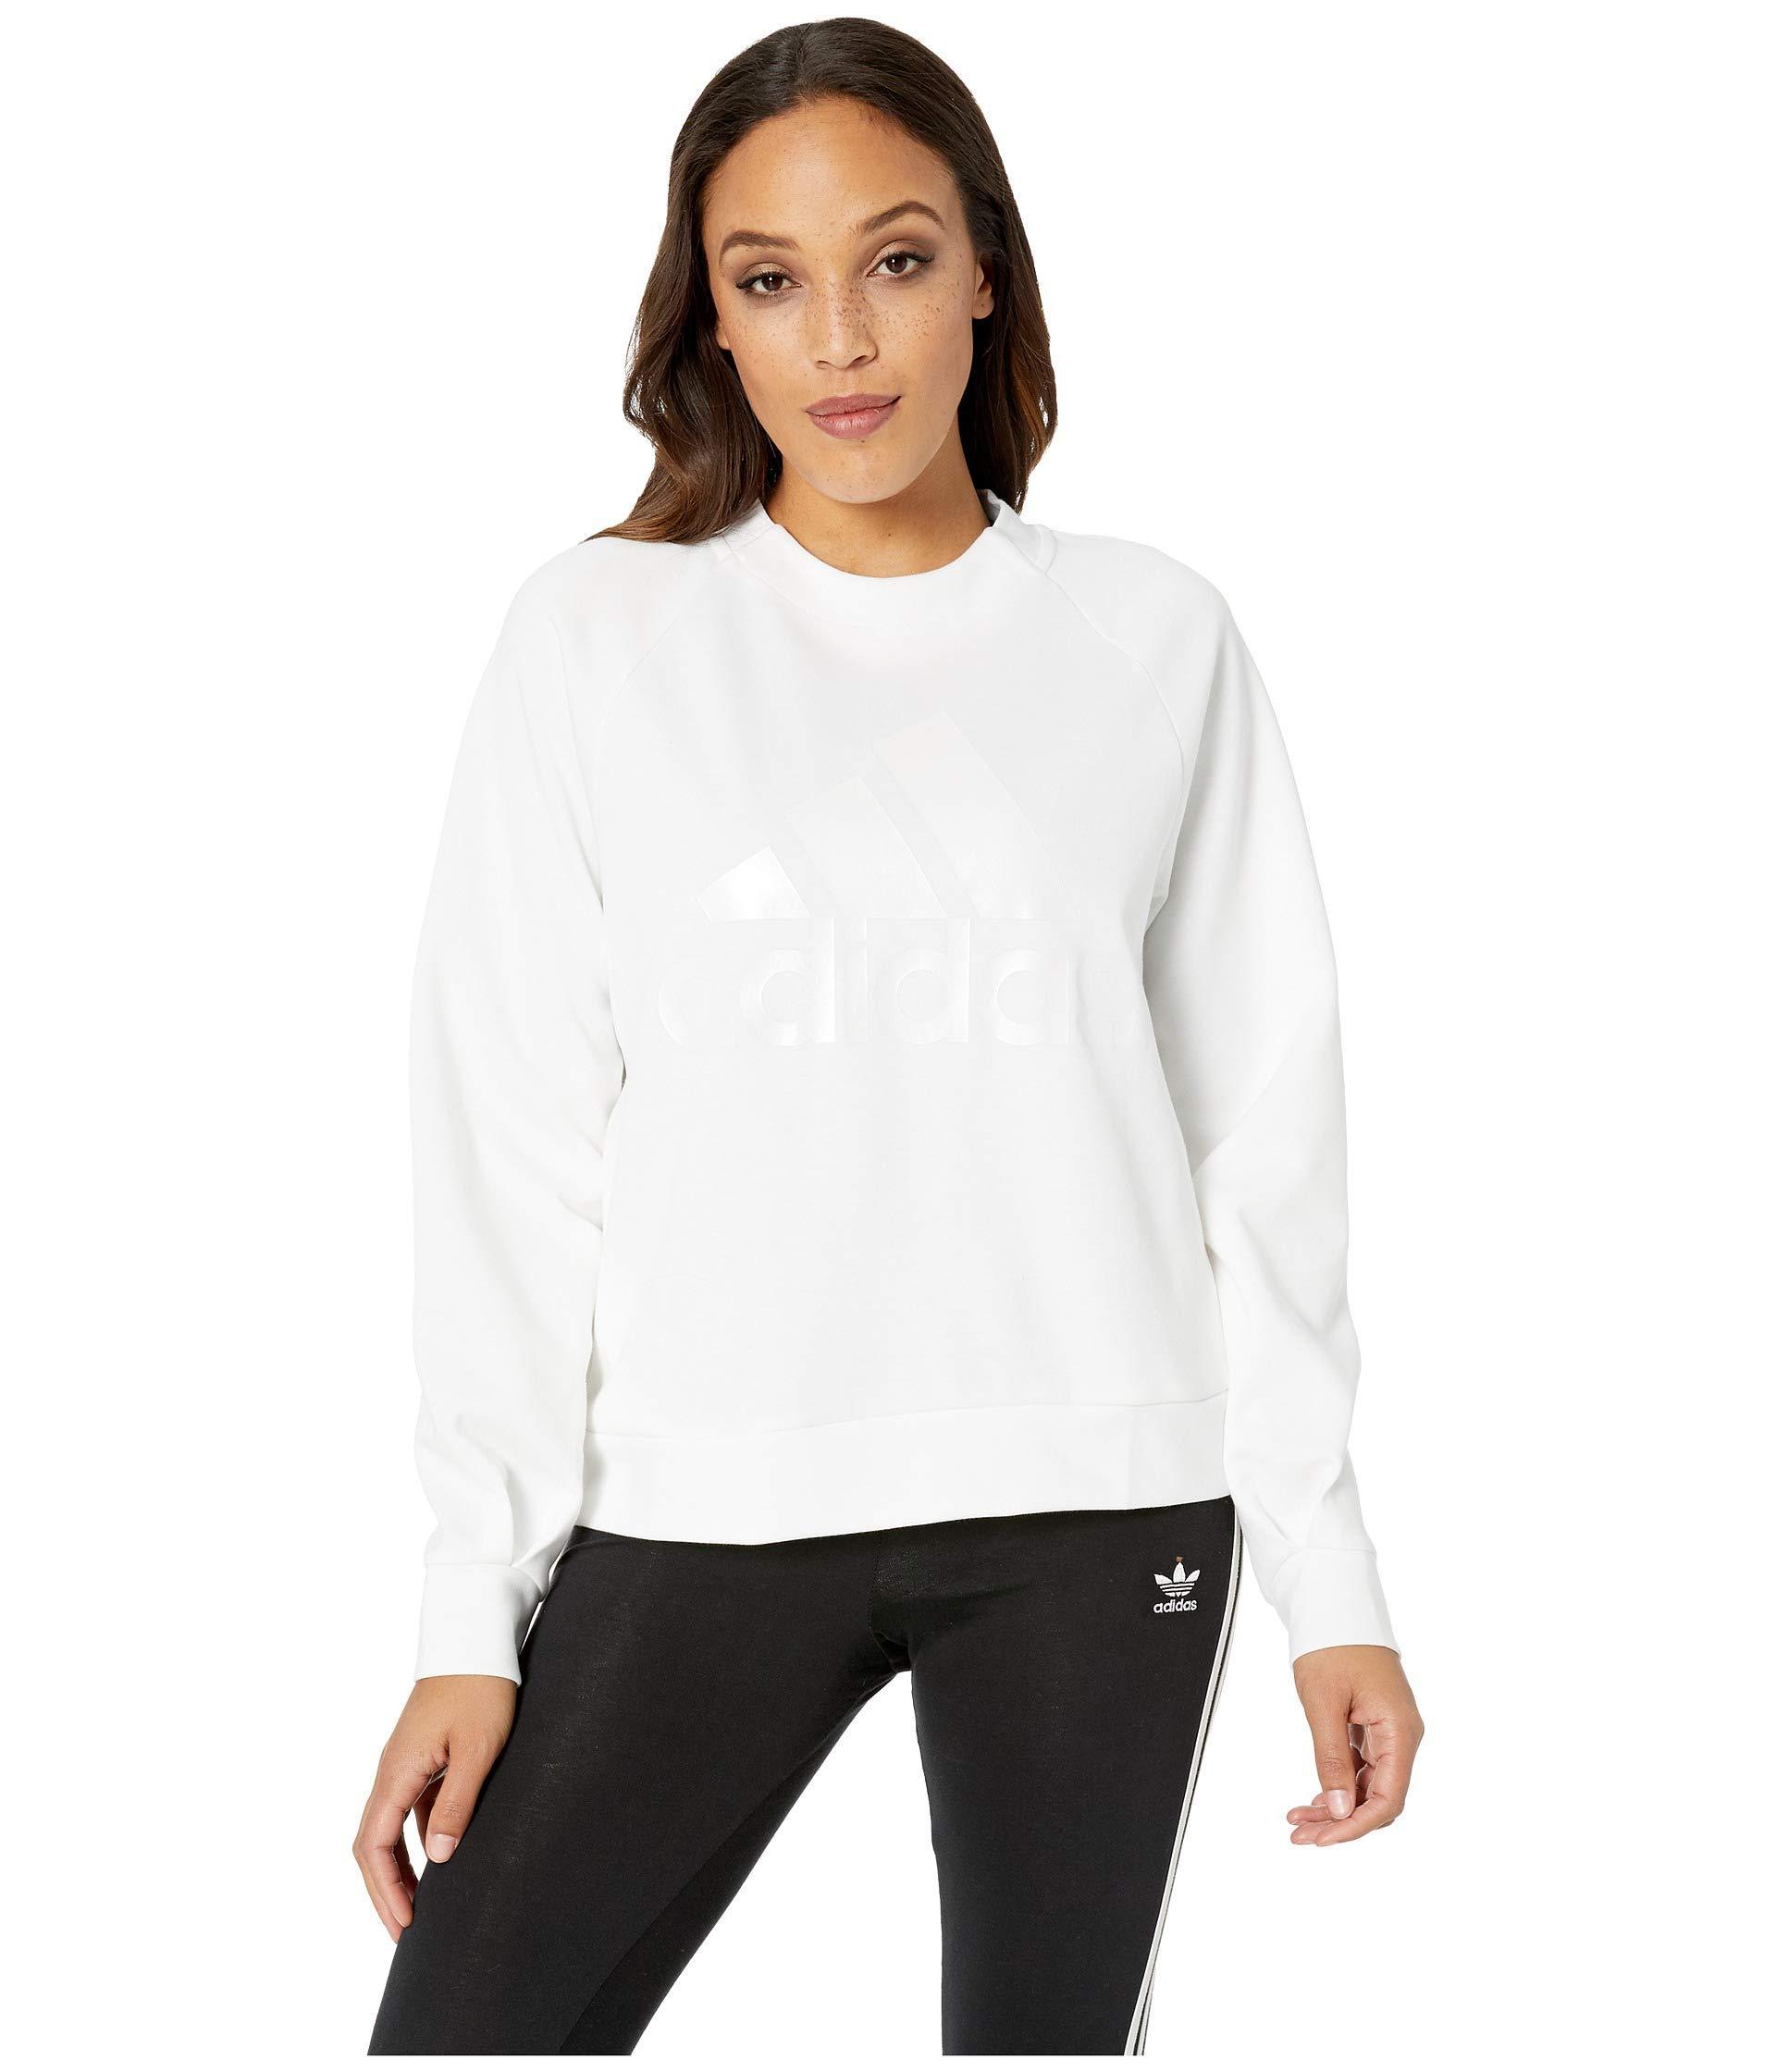 d45ca315cd Adidas - White Id Glory Crew (black) Women s Sweatshirt - Lyst. View  fullscreen